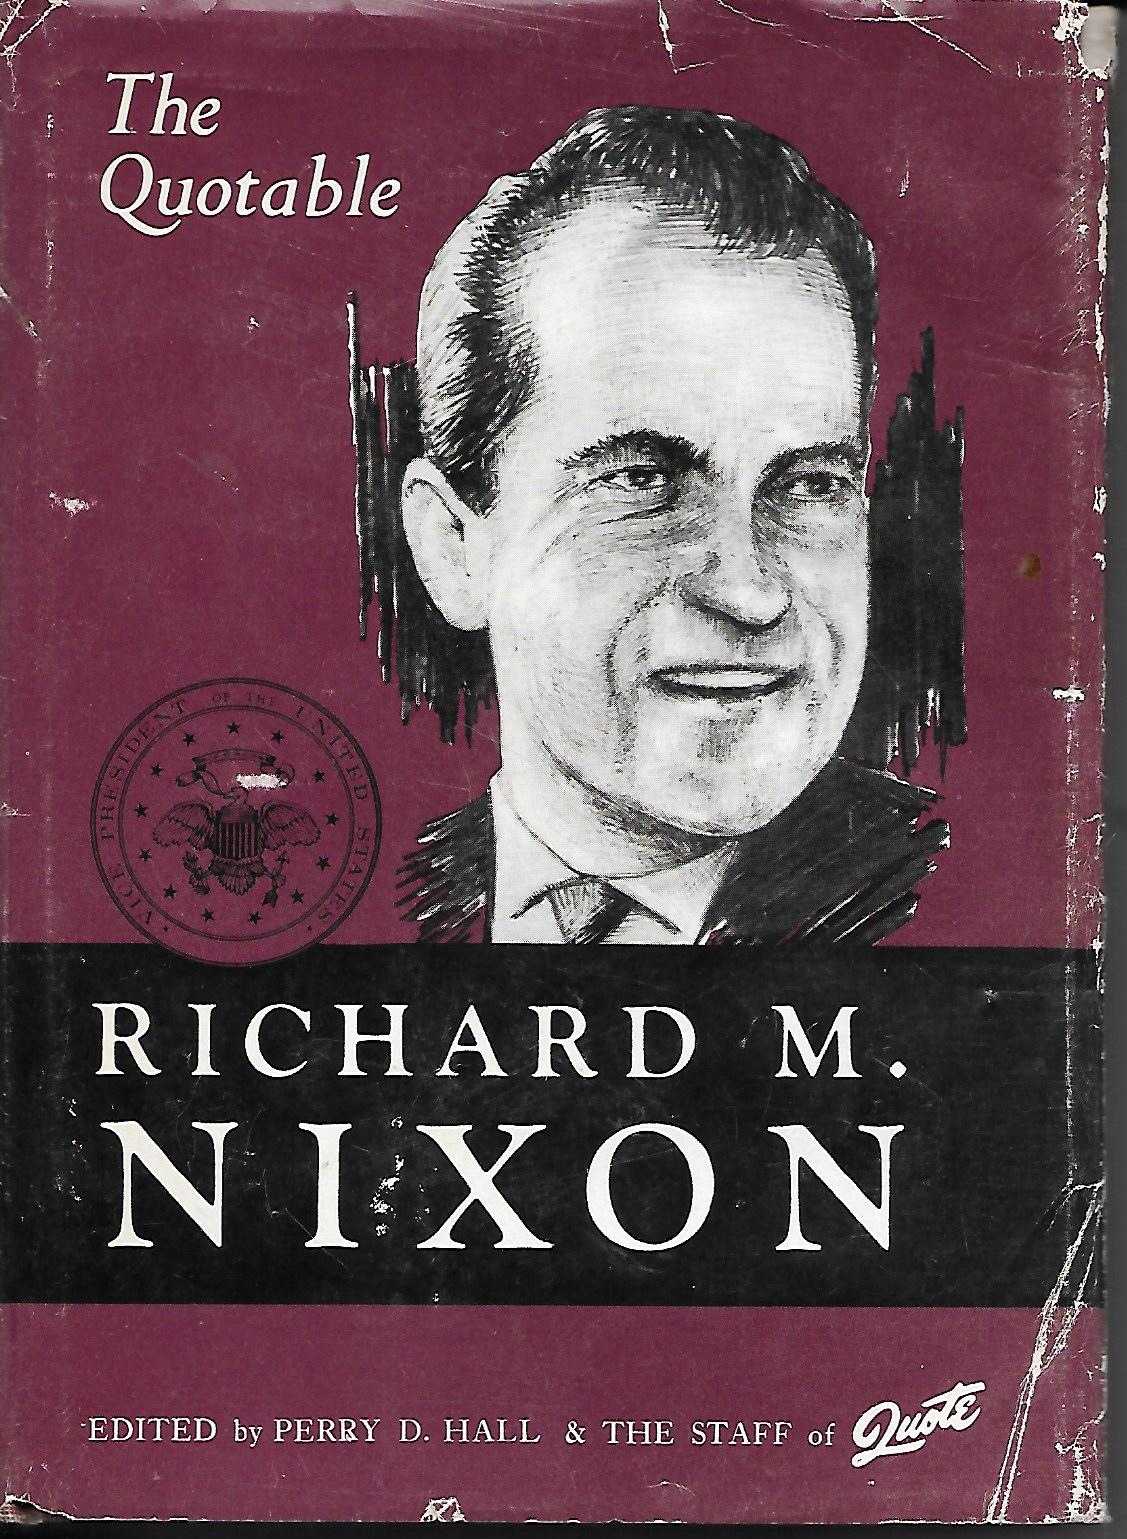 Image for The Quotable Richard M. Nixon